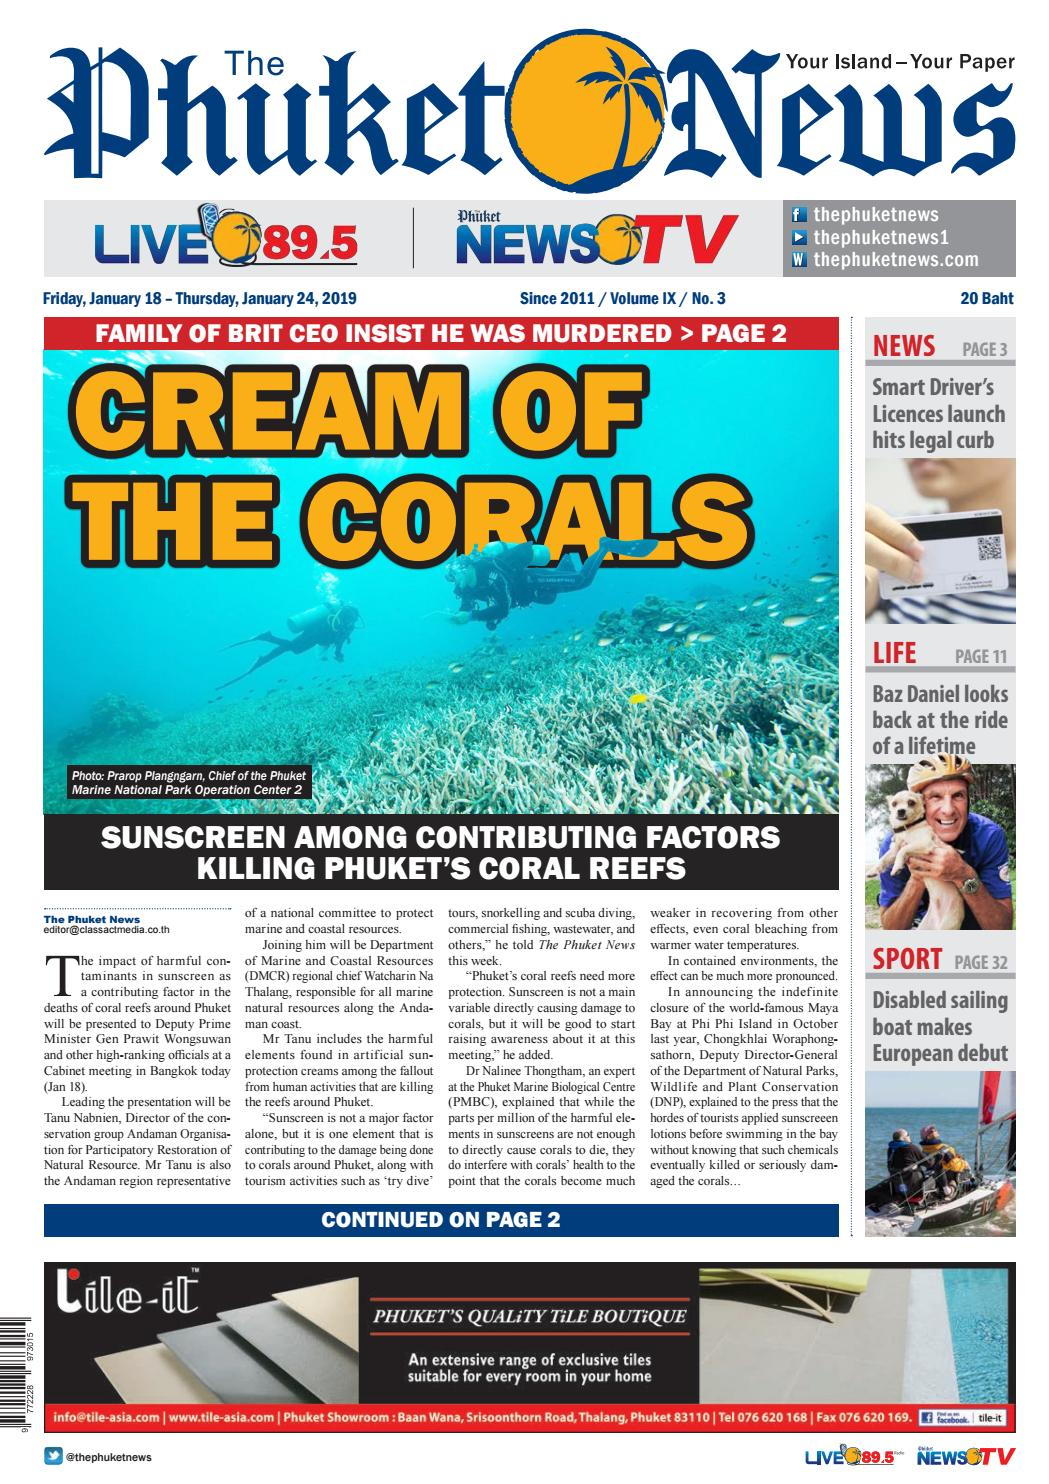 The Phuket News 18 January 2019 by The Phuket News - issuu